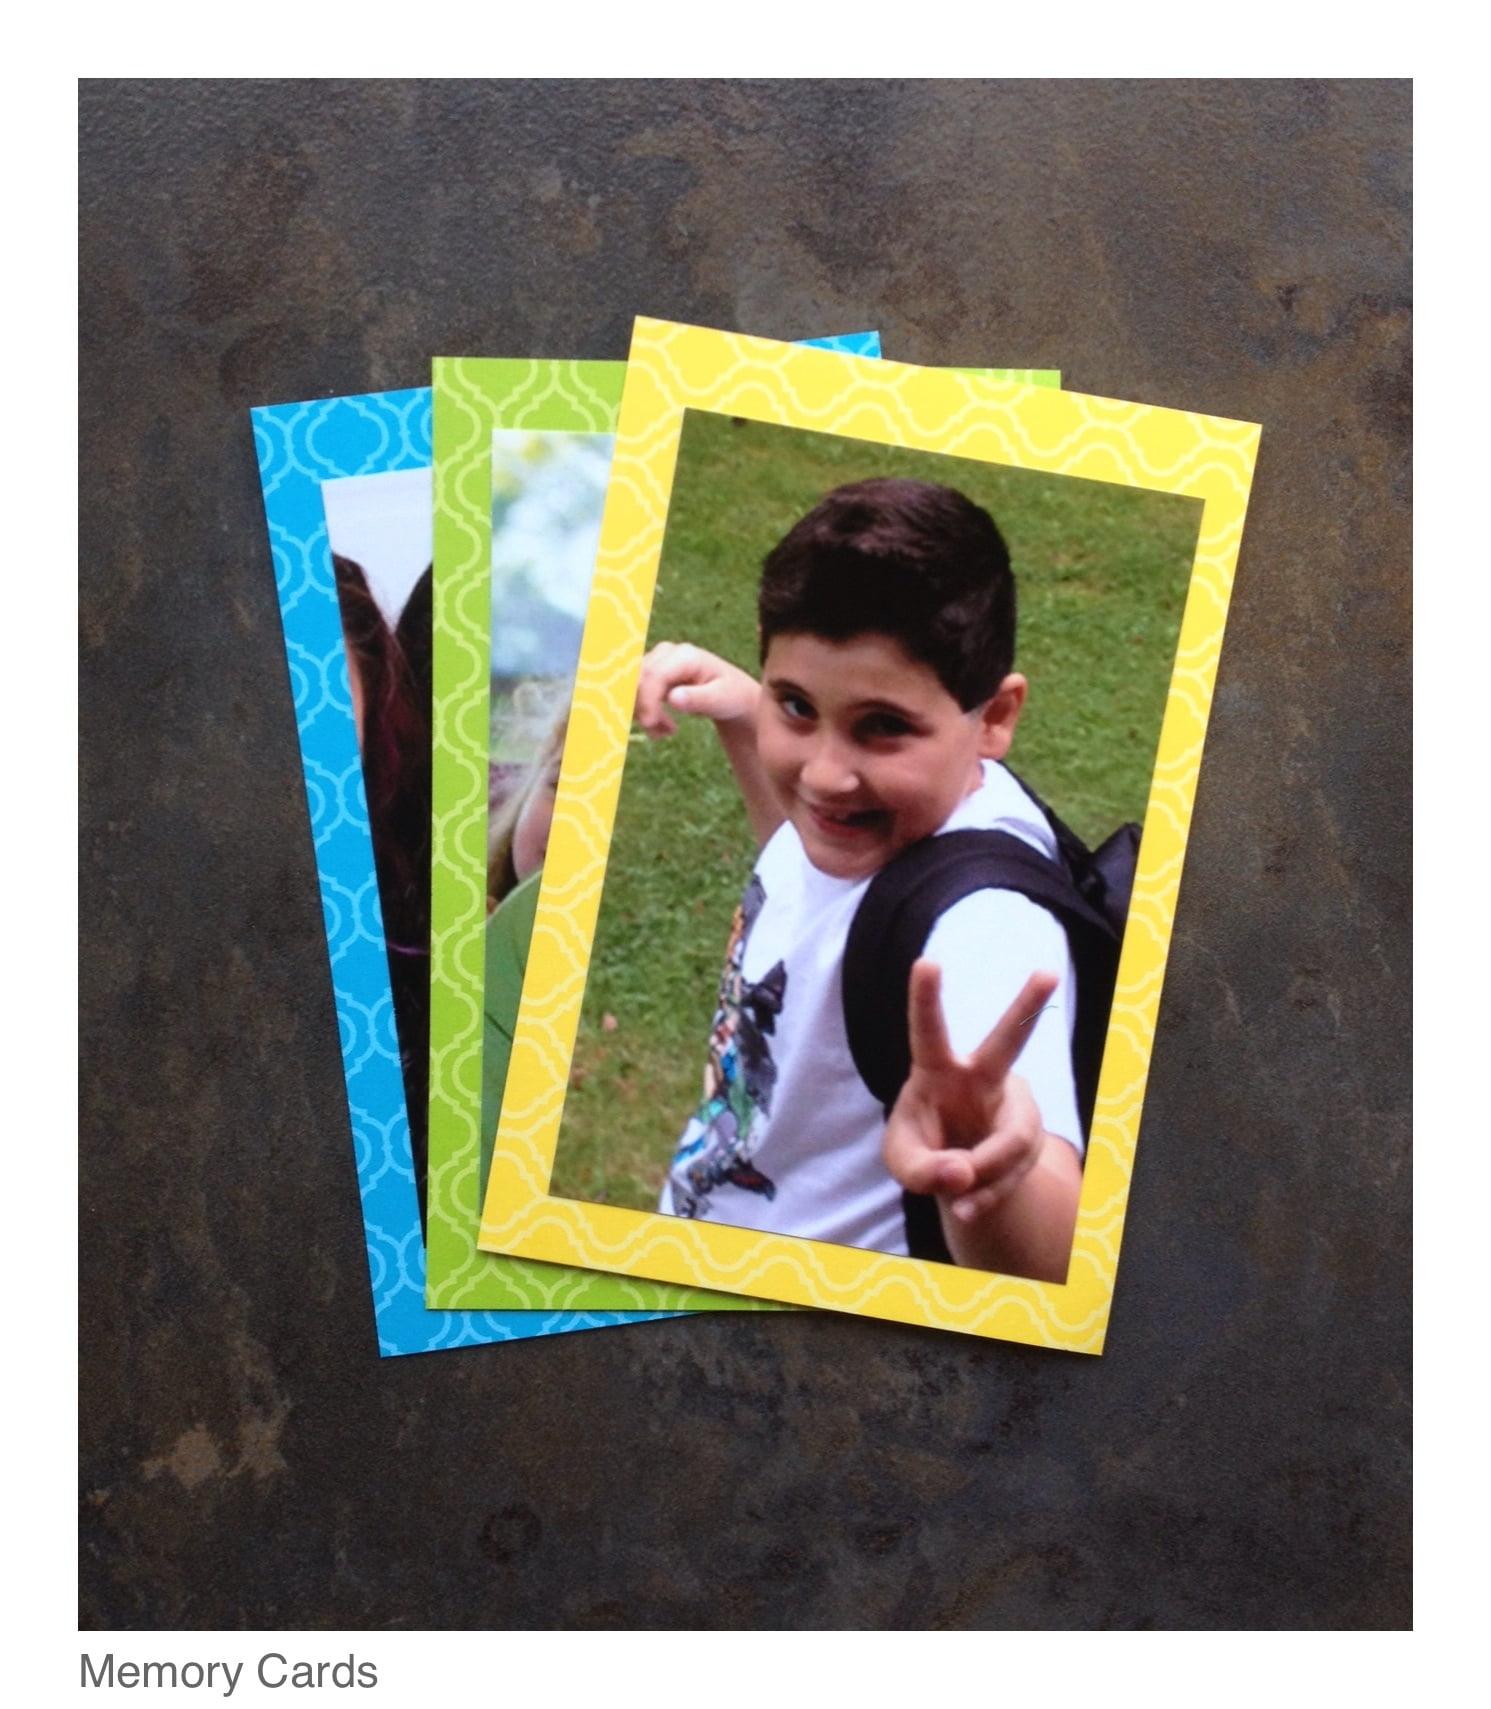 Dementia Photo Cards